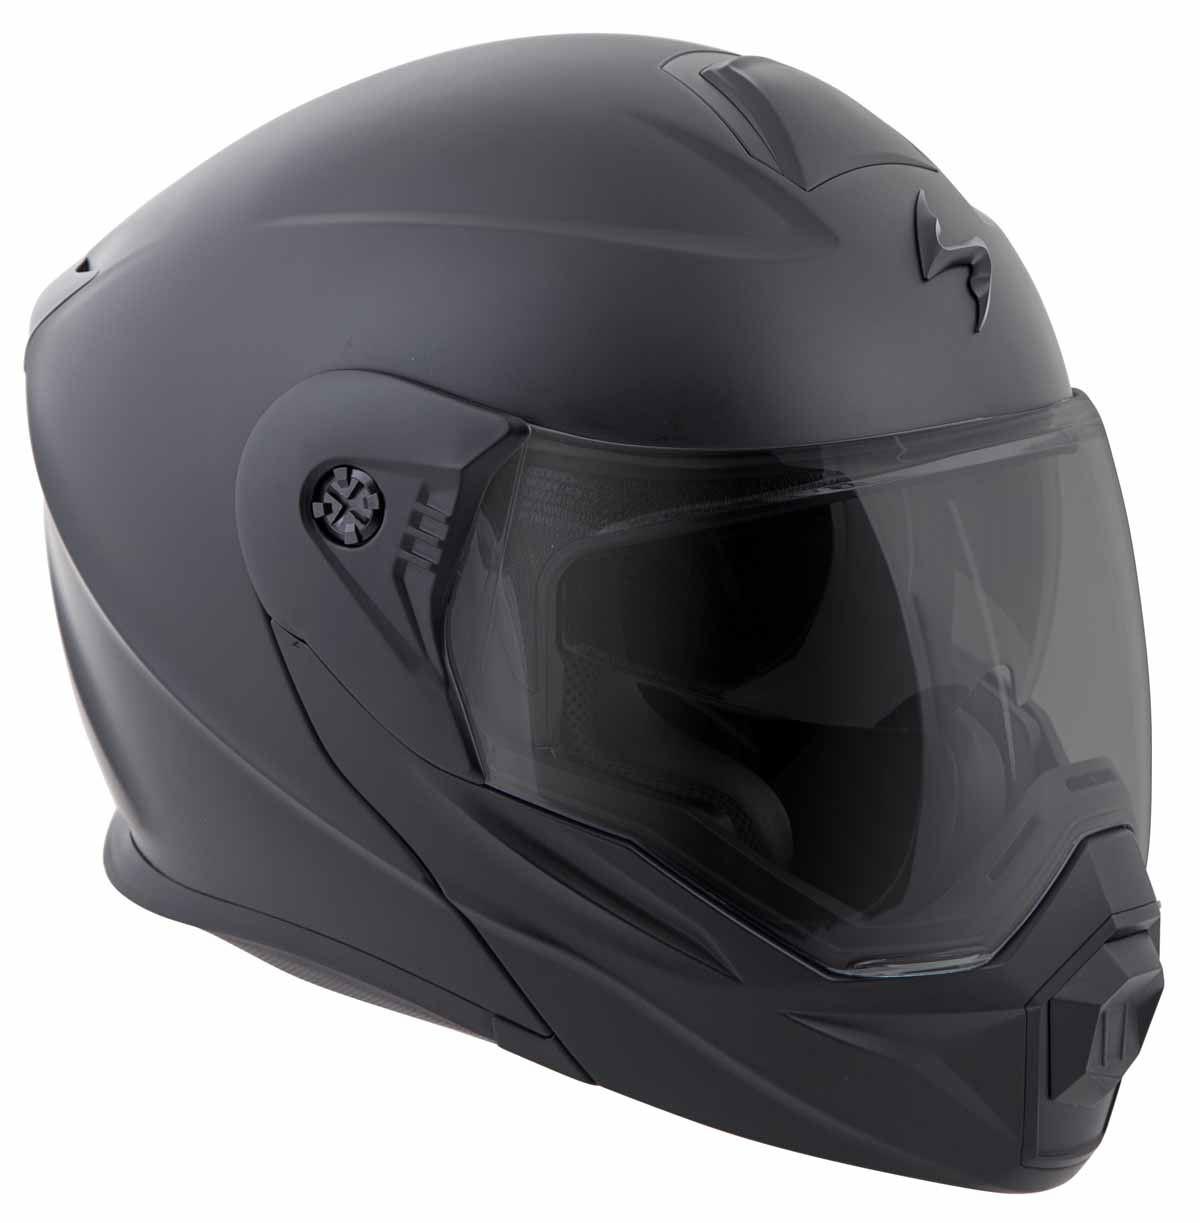 Scorpion-EXO-AT950-Helmet-Flip-Up-Modular-Dual-Sport-Adventure-ADV-DOT-XS-3XL miniature 9